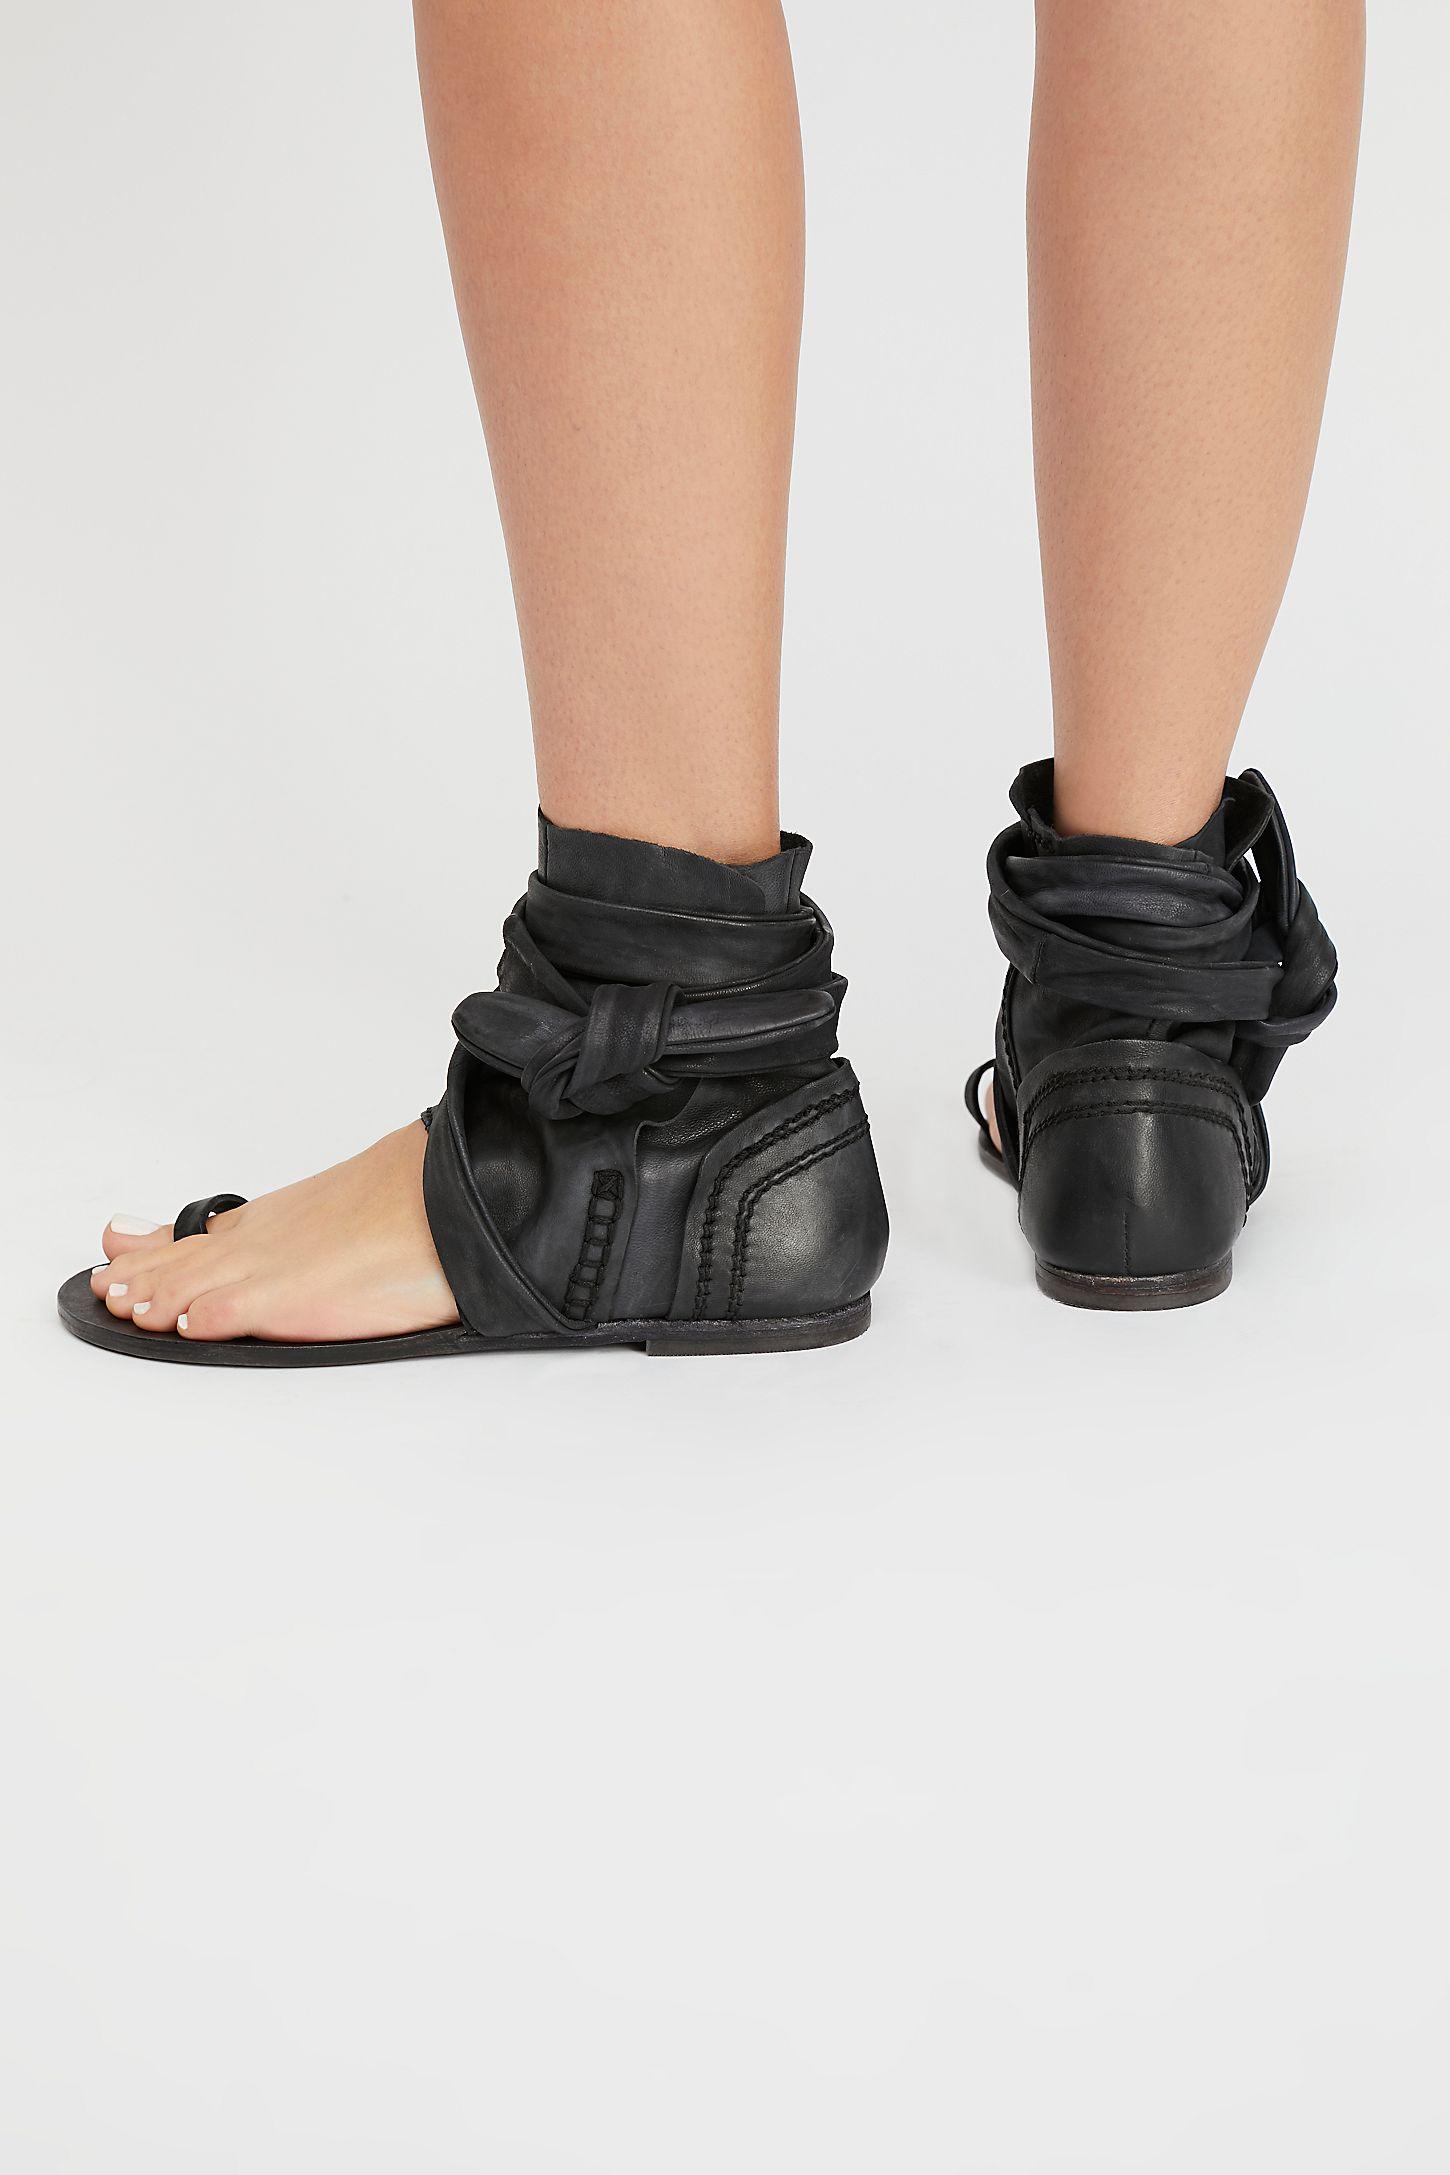 b3ce13bd8 Slide View 4  Delaney Boot Sandal